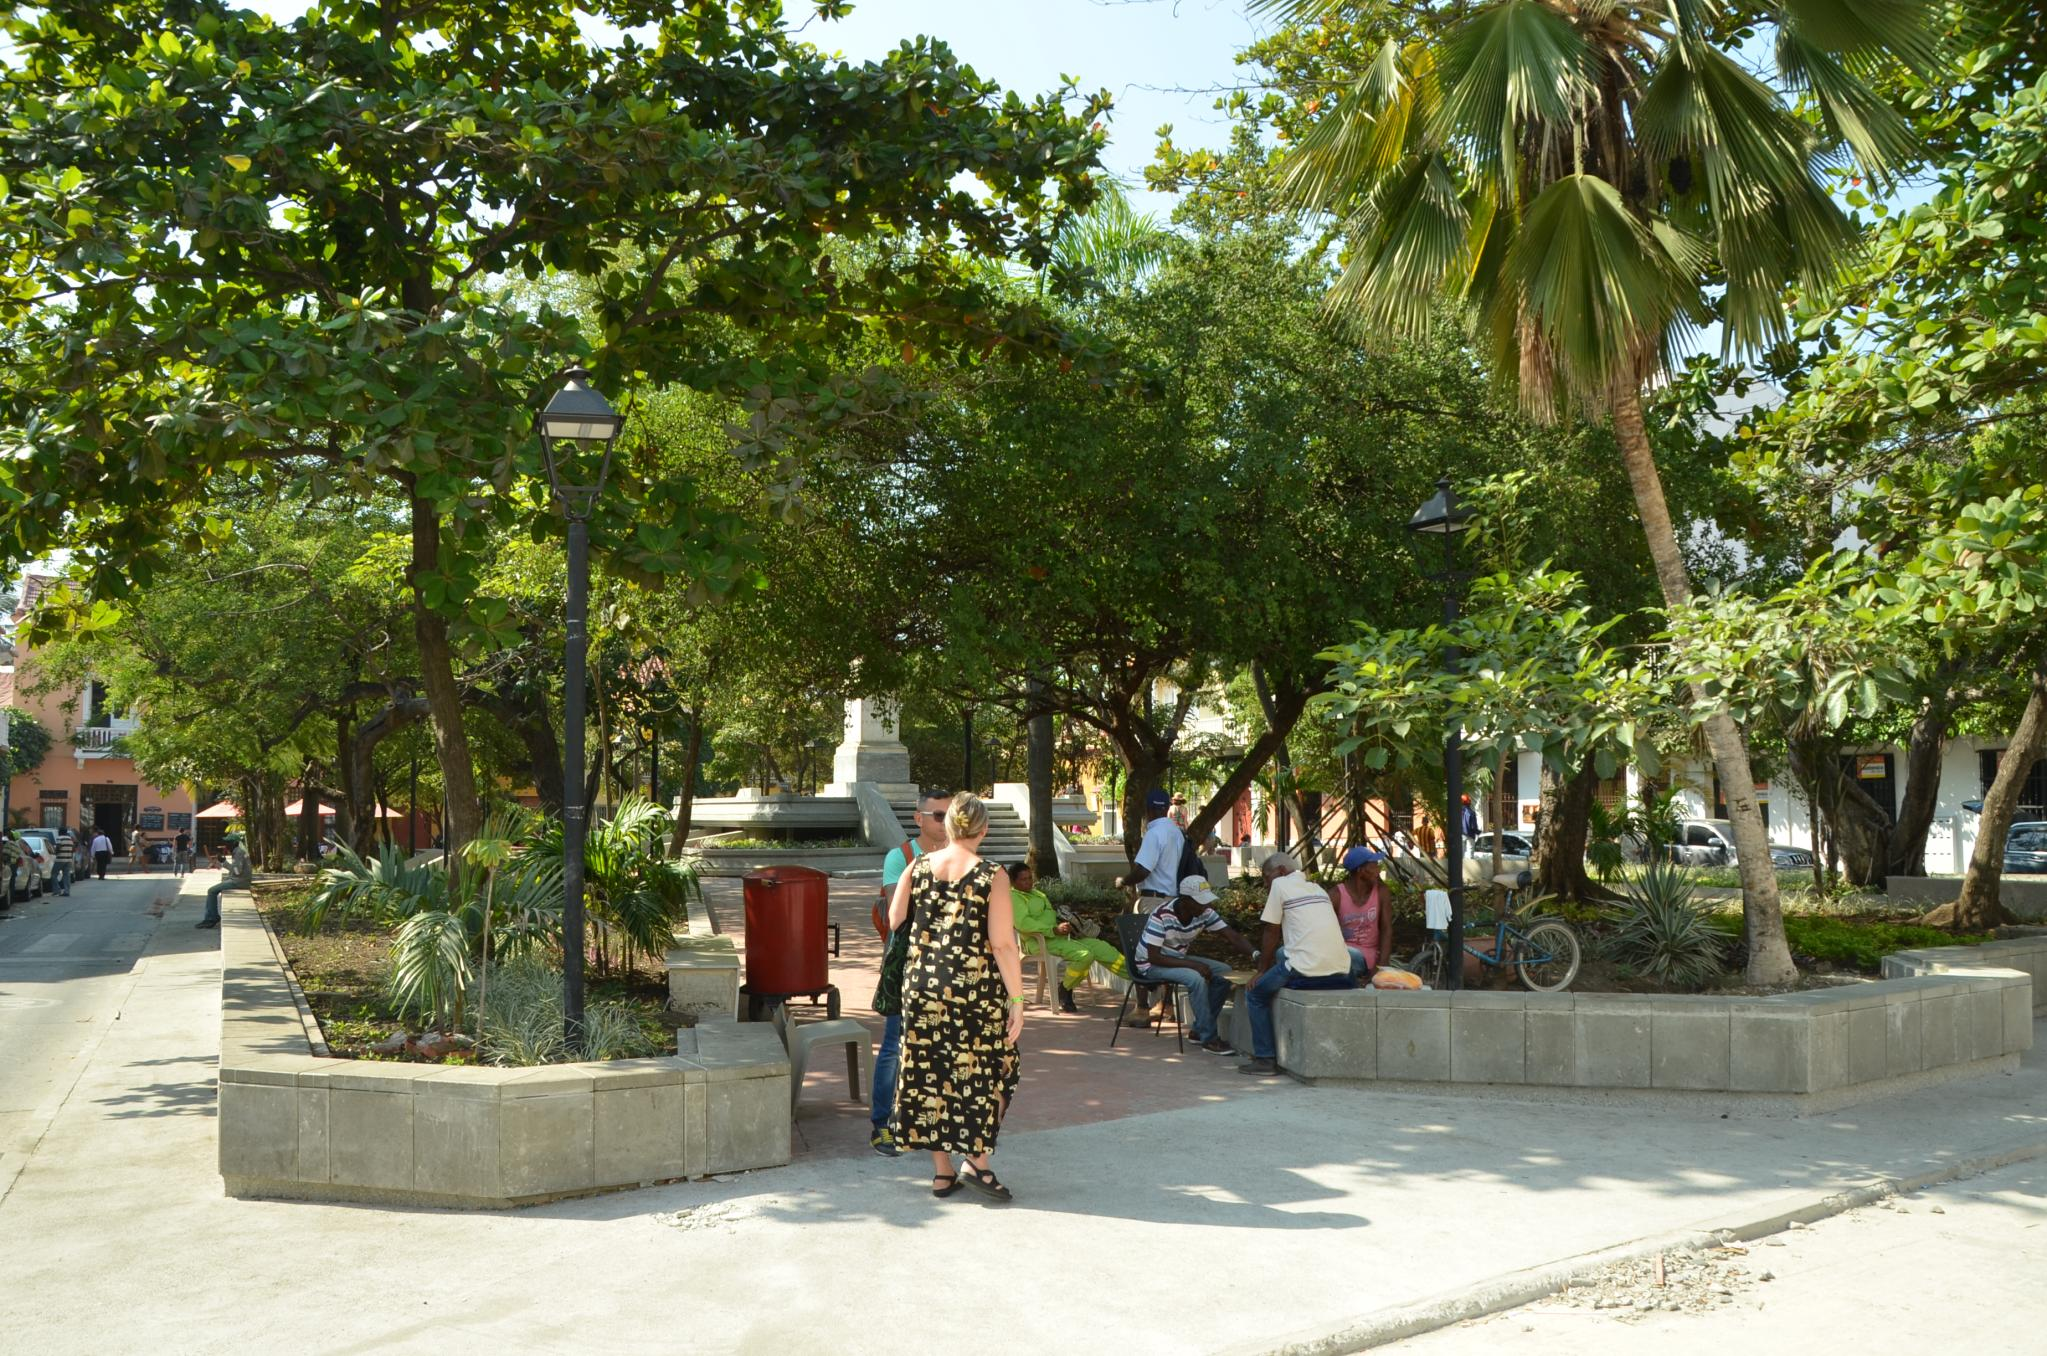 File:The Plaza Fernandez De Madrid, Cartagena, Colombia